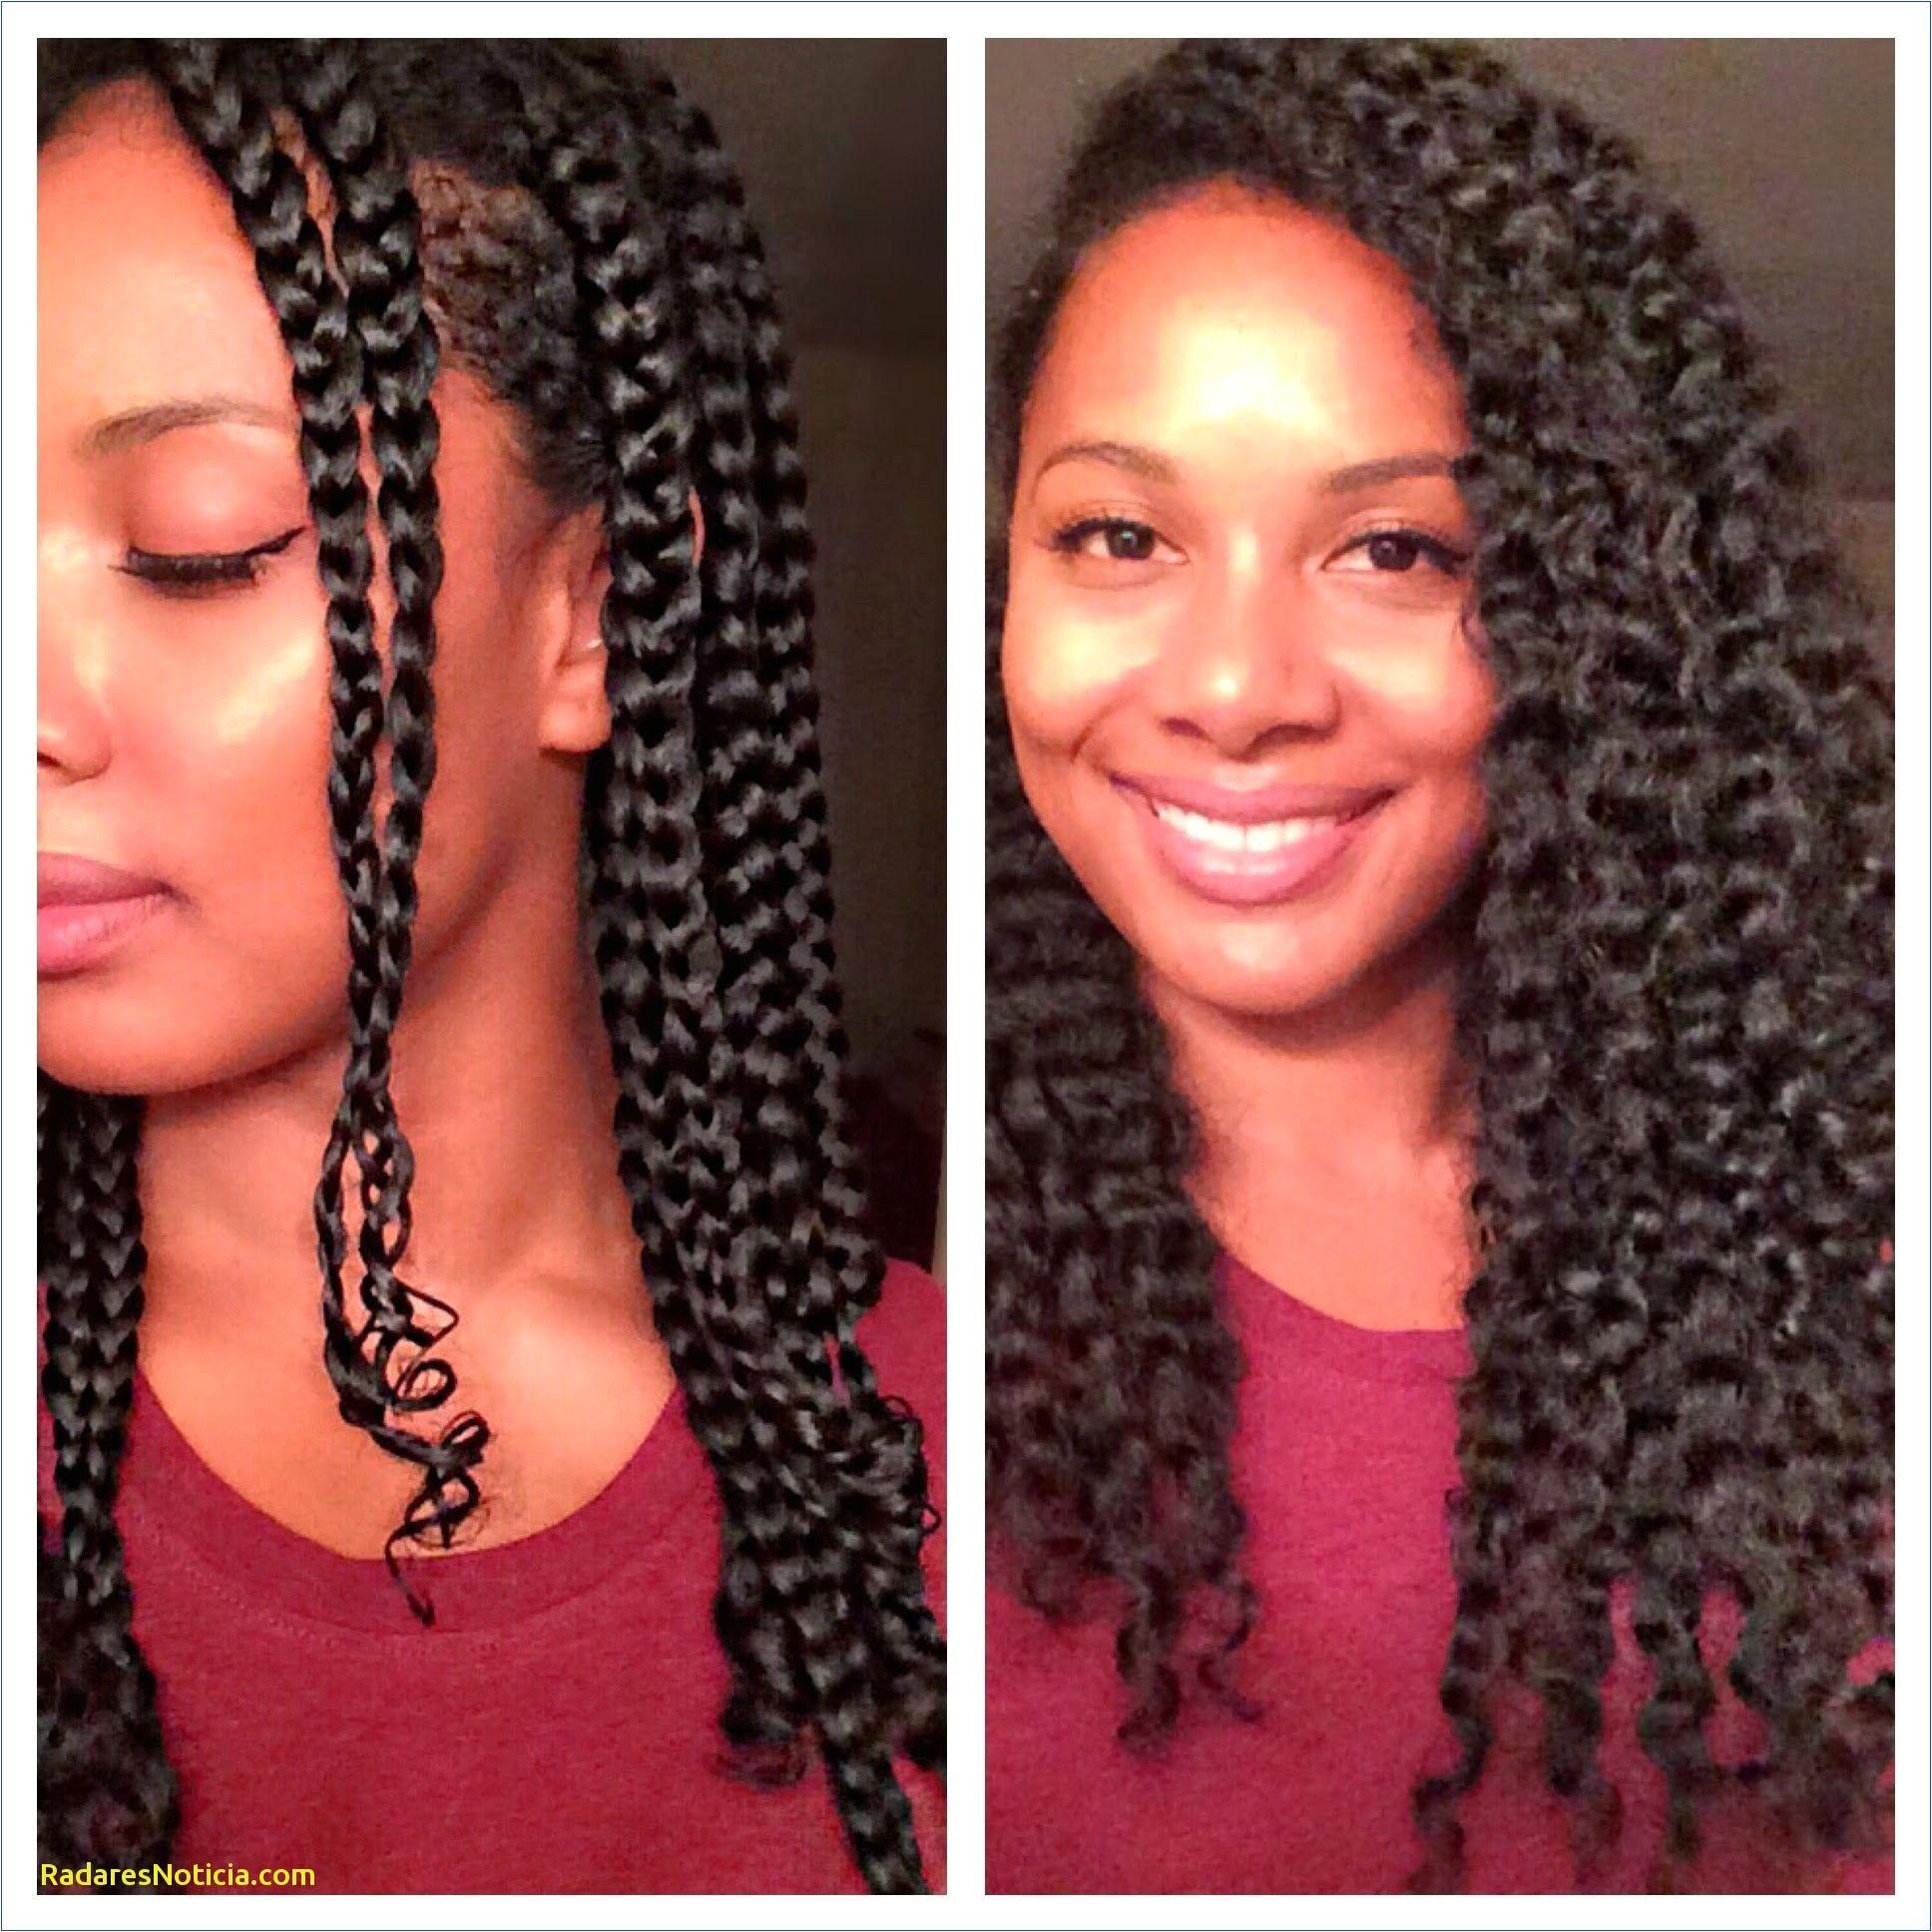 Braid Hairstyles Black 6 Best Braided Hairstyles for Kids